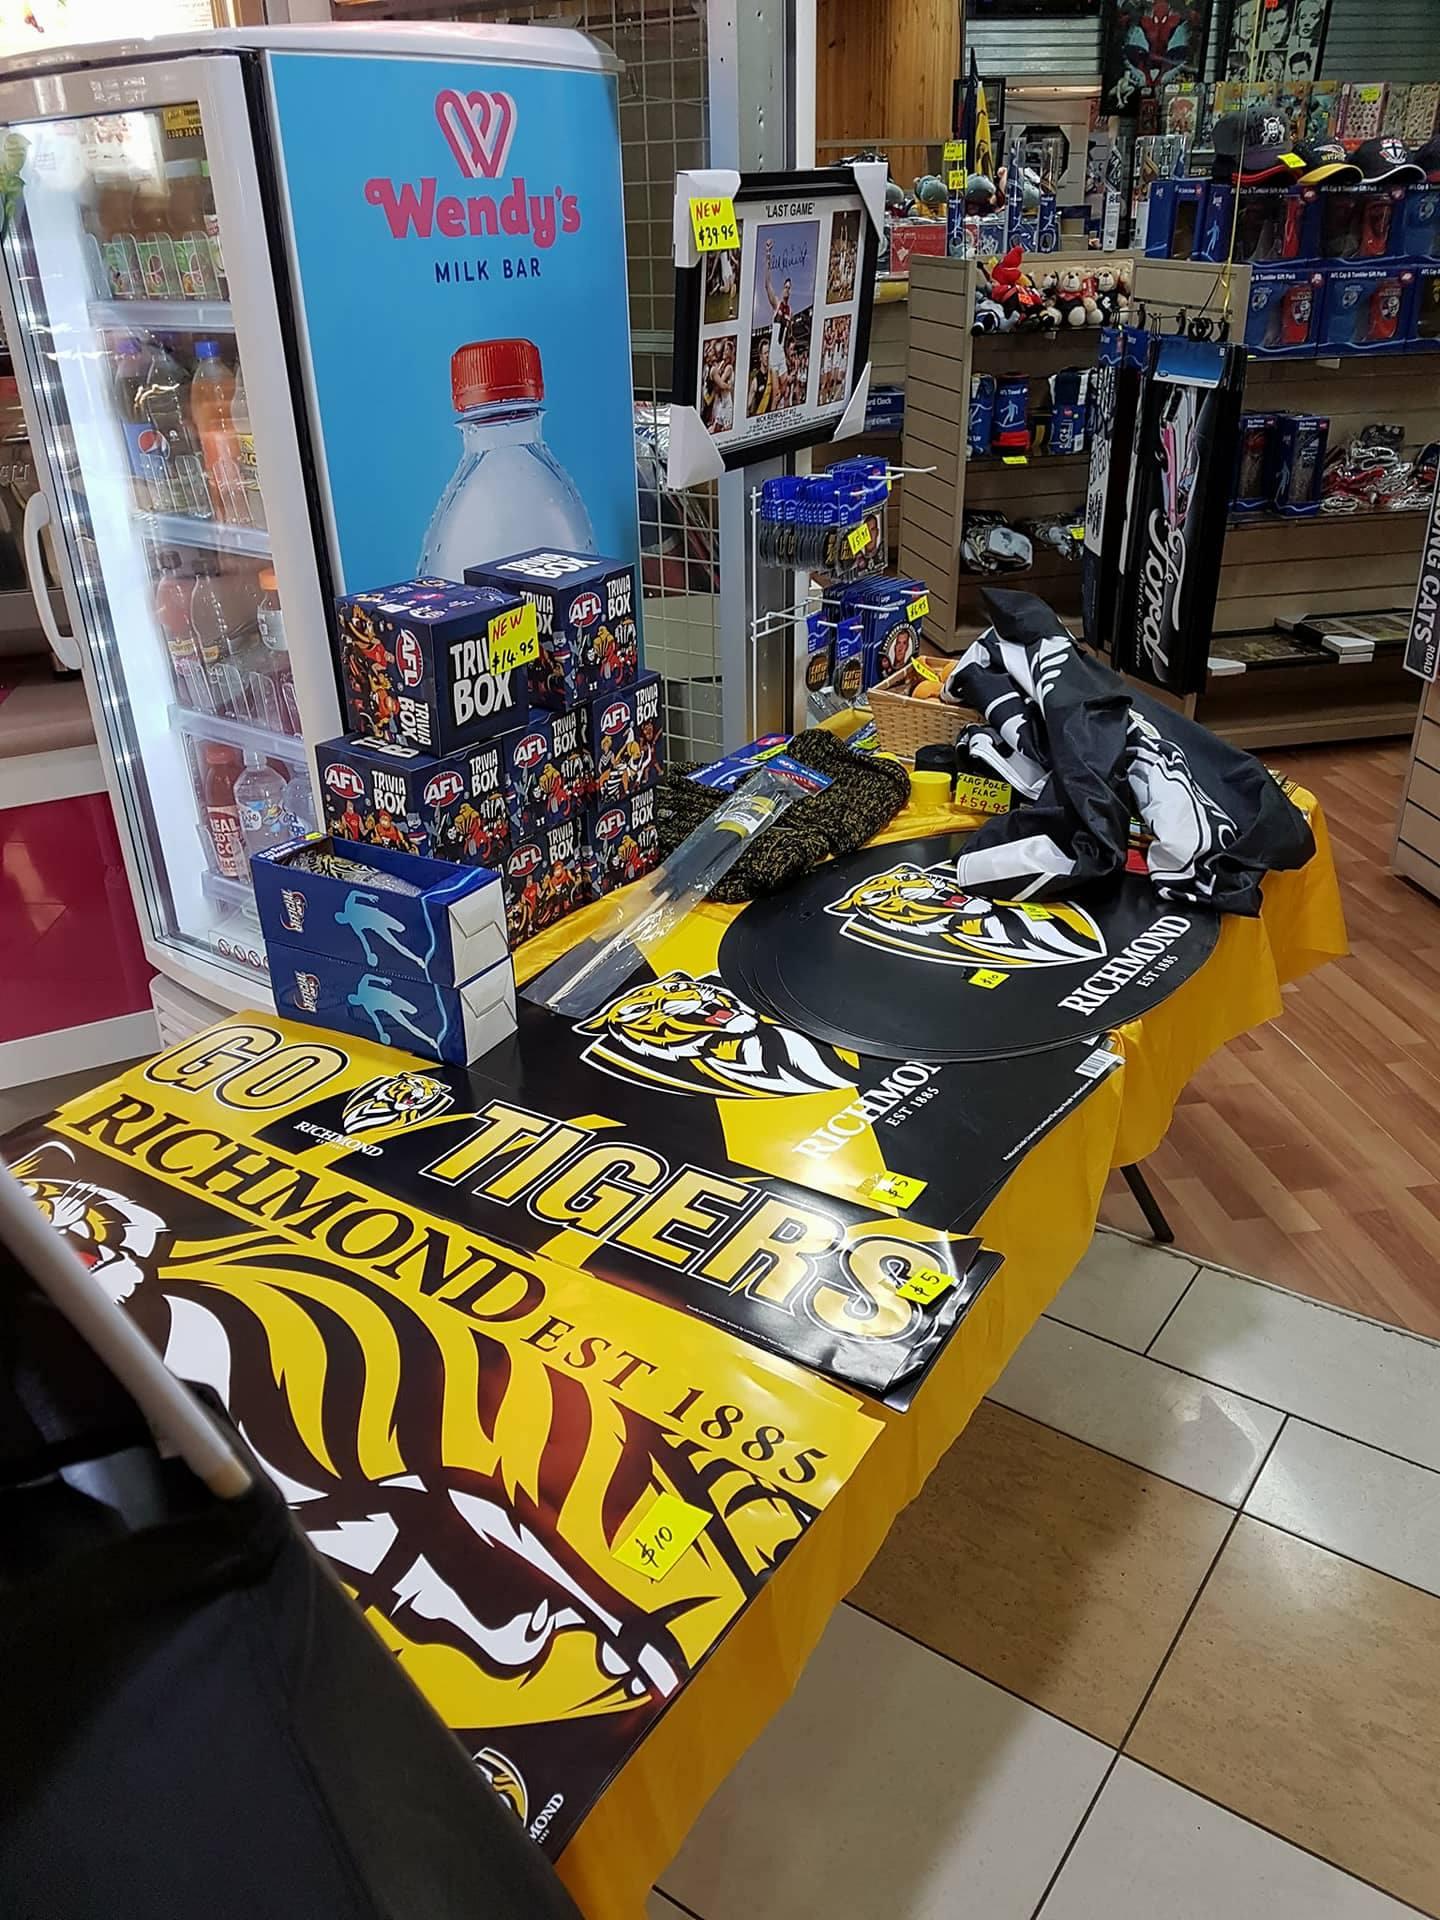 Some of the Tigers memorabilia for sale.